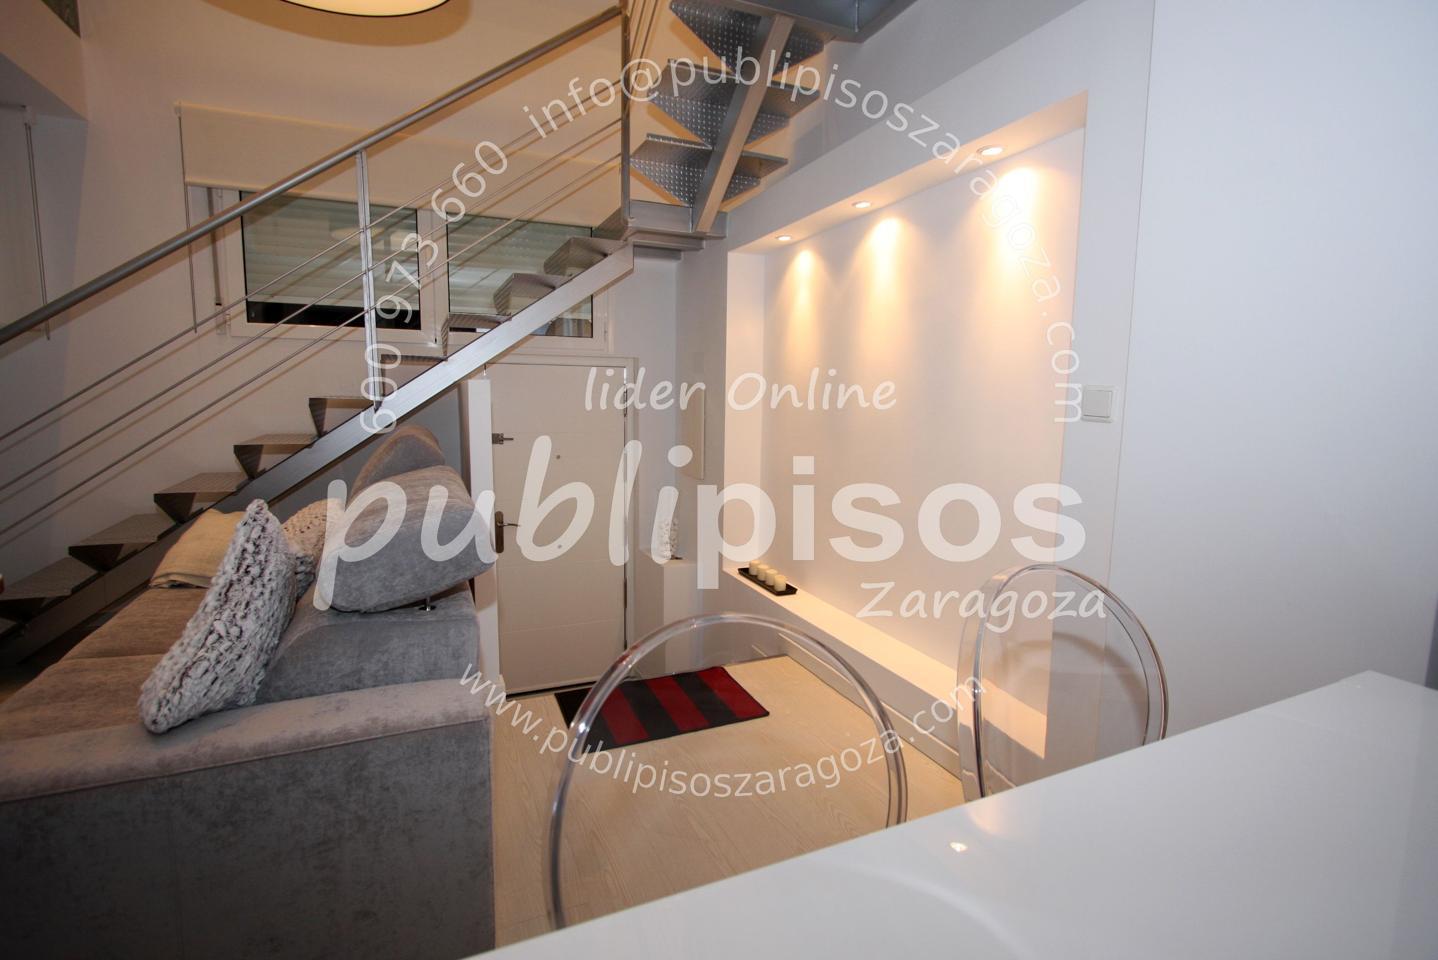 Venta Atico Duplex Obra Nueva Centro Casco Histórico Zaragoza|PUBLIPISOS Inmobiliarias-29